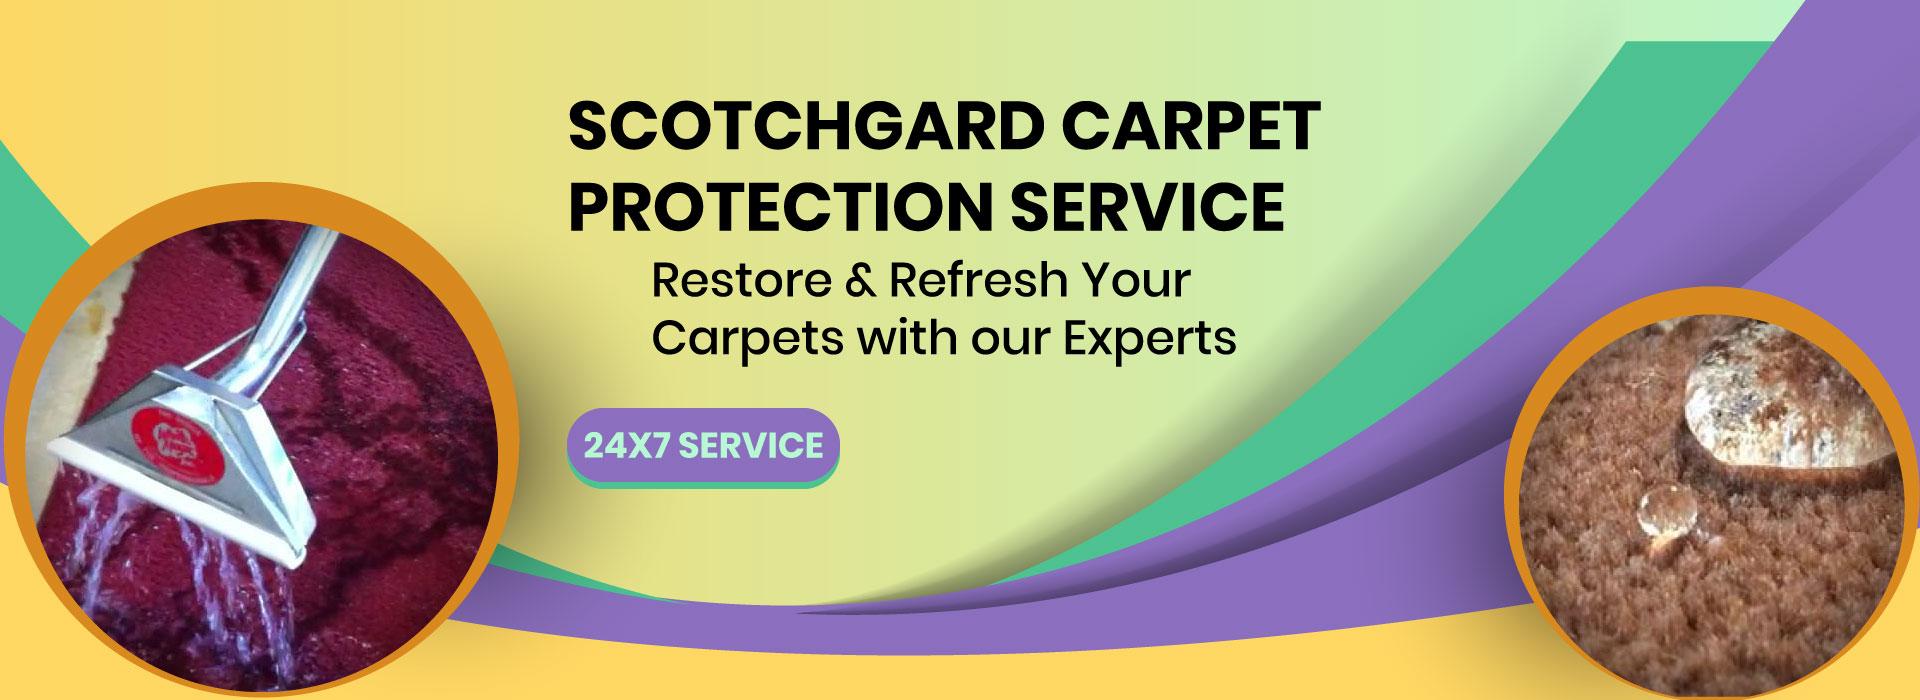 Scotchgard Carpet Protection Melbourne